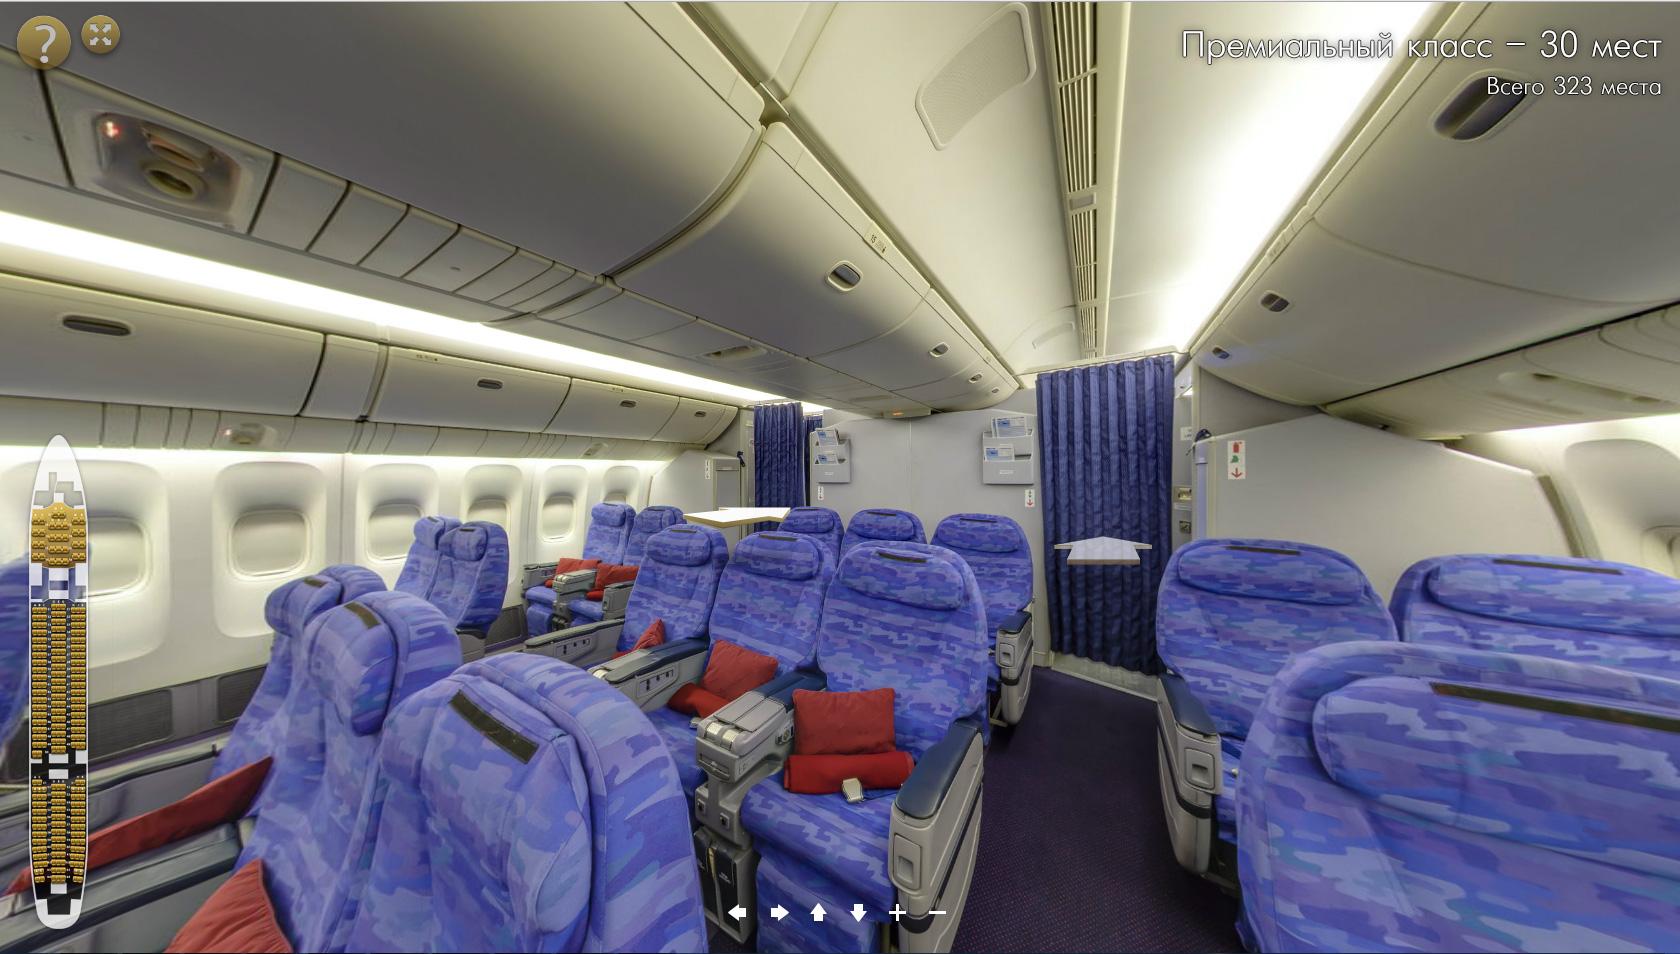 Боинг 777 200 схема салона трансаэро лучшие места фото 542